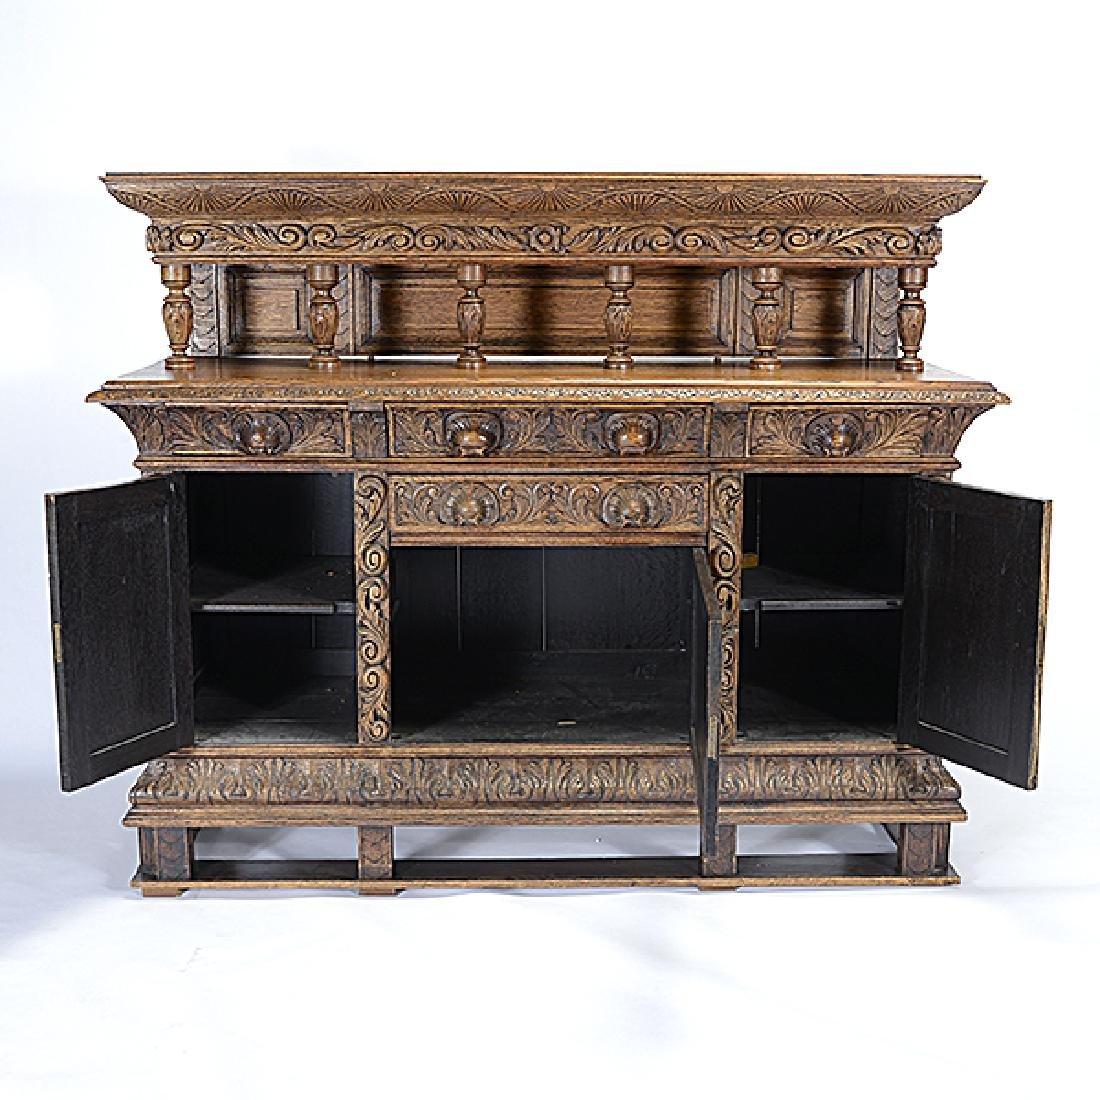 Renaissance Revival Buffet Sideboard - 4